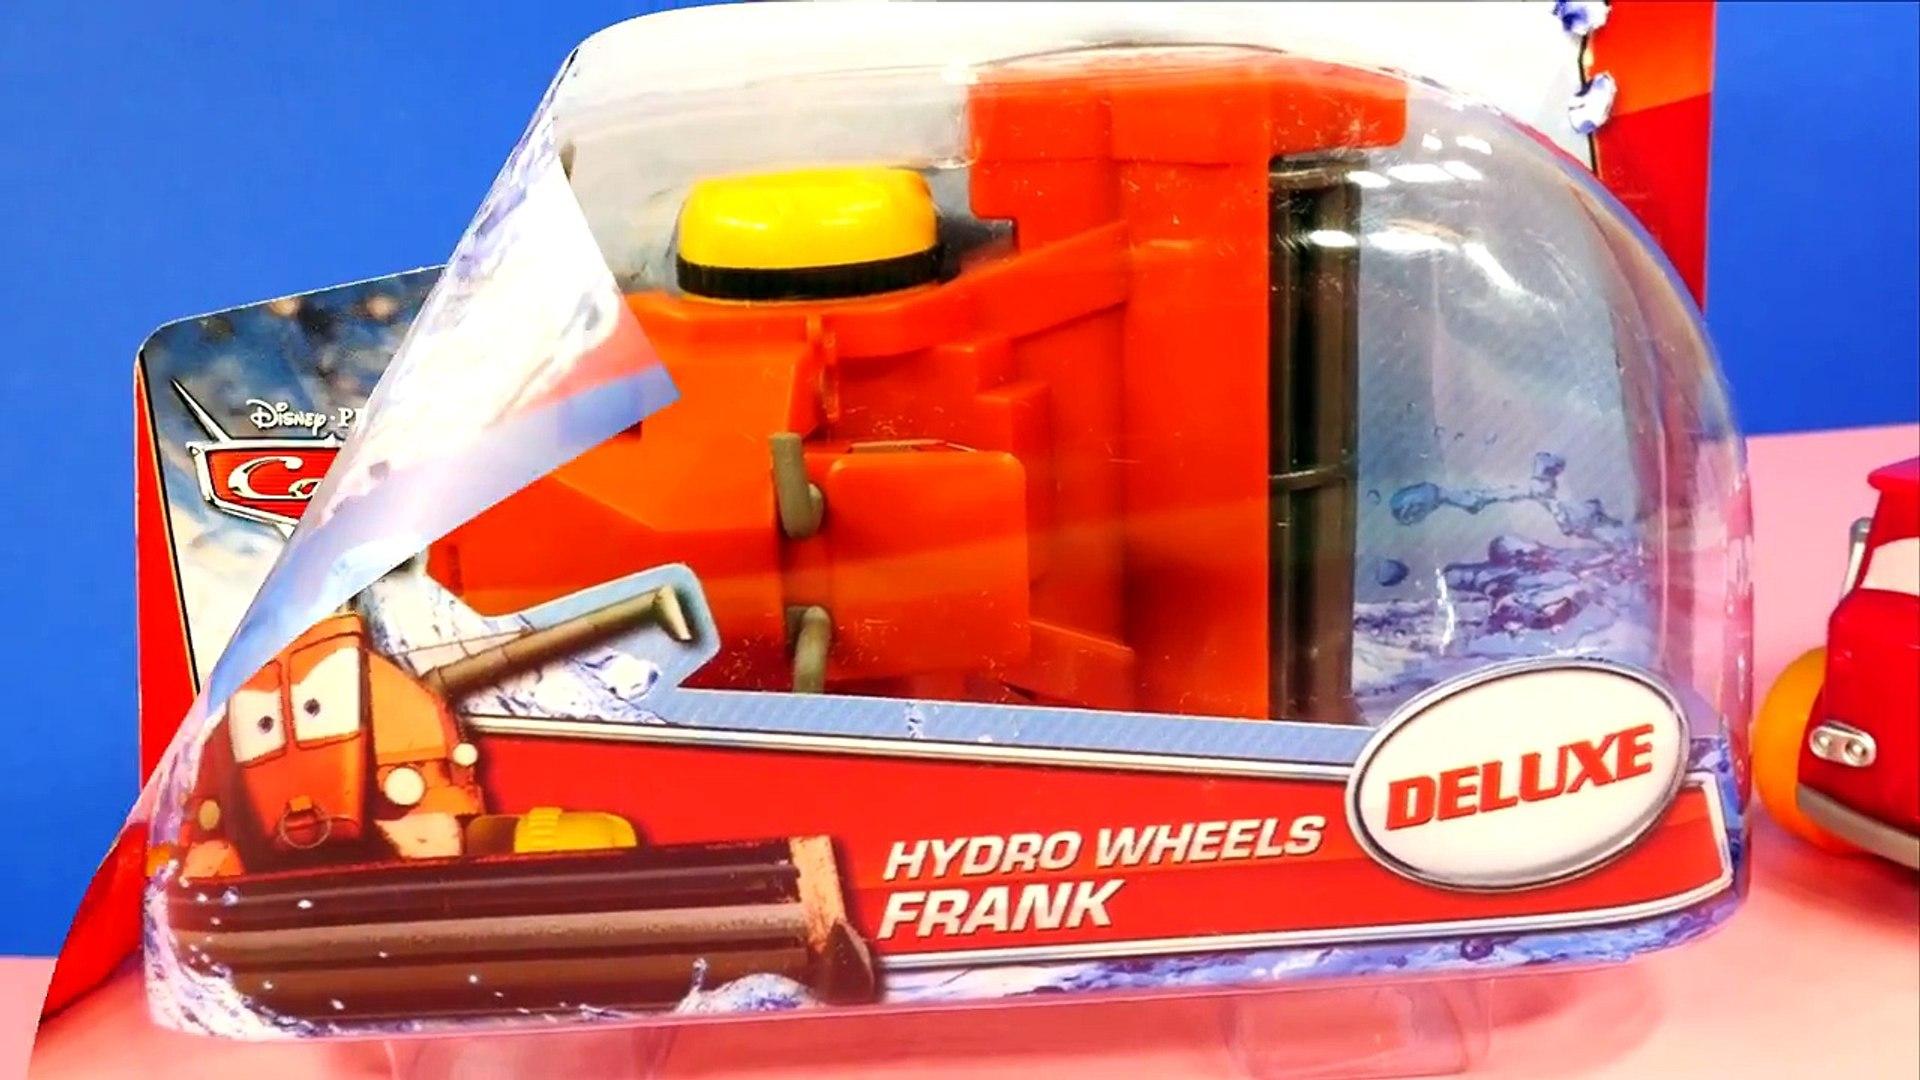 Disney Pixar Cars Hydro Wheels Deluxe Mack Vehicle